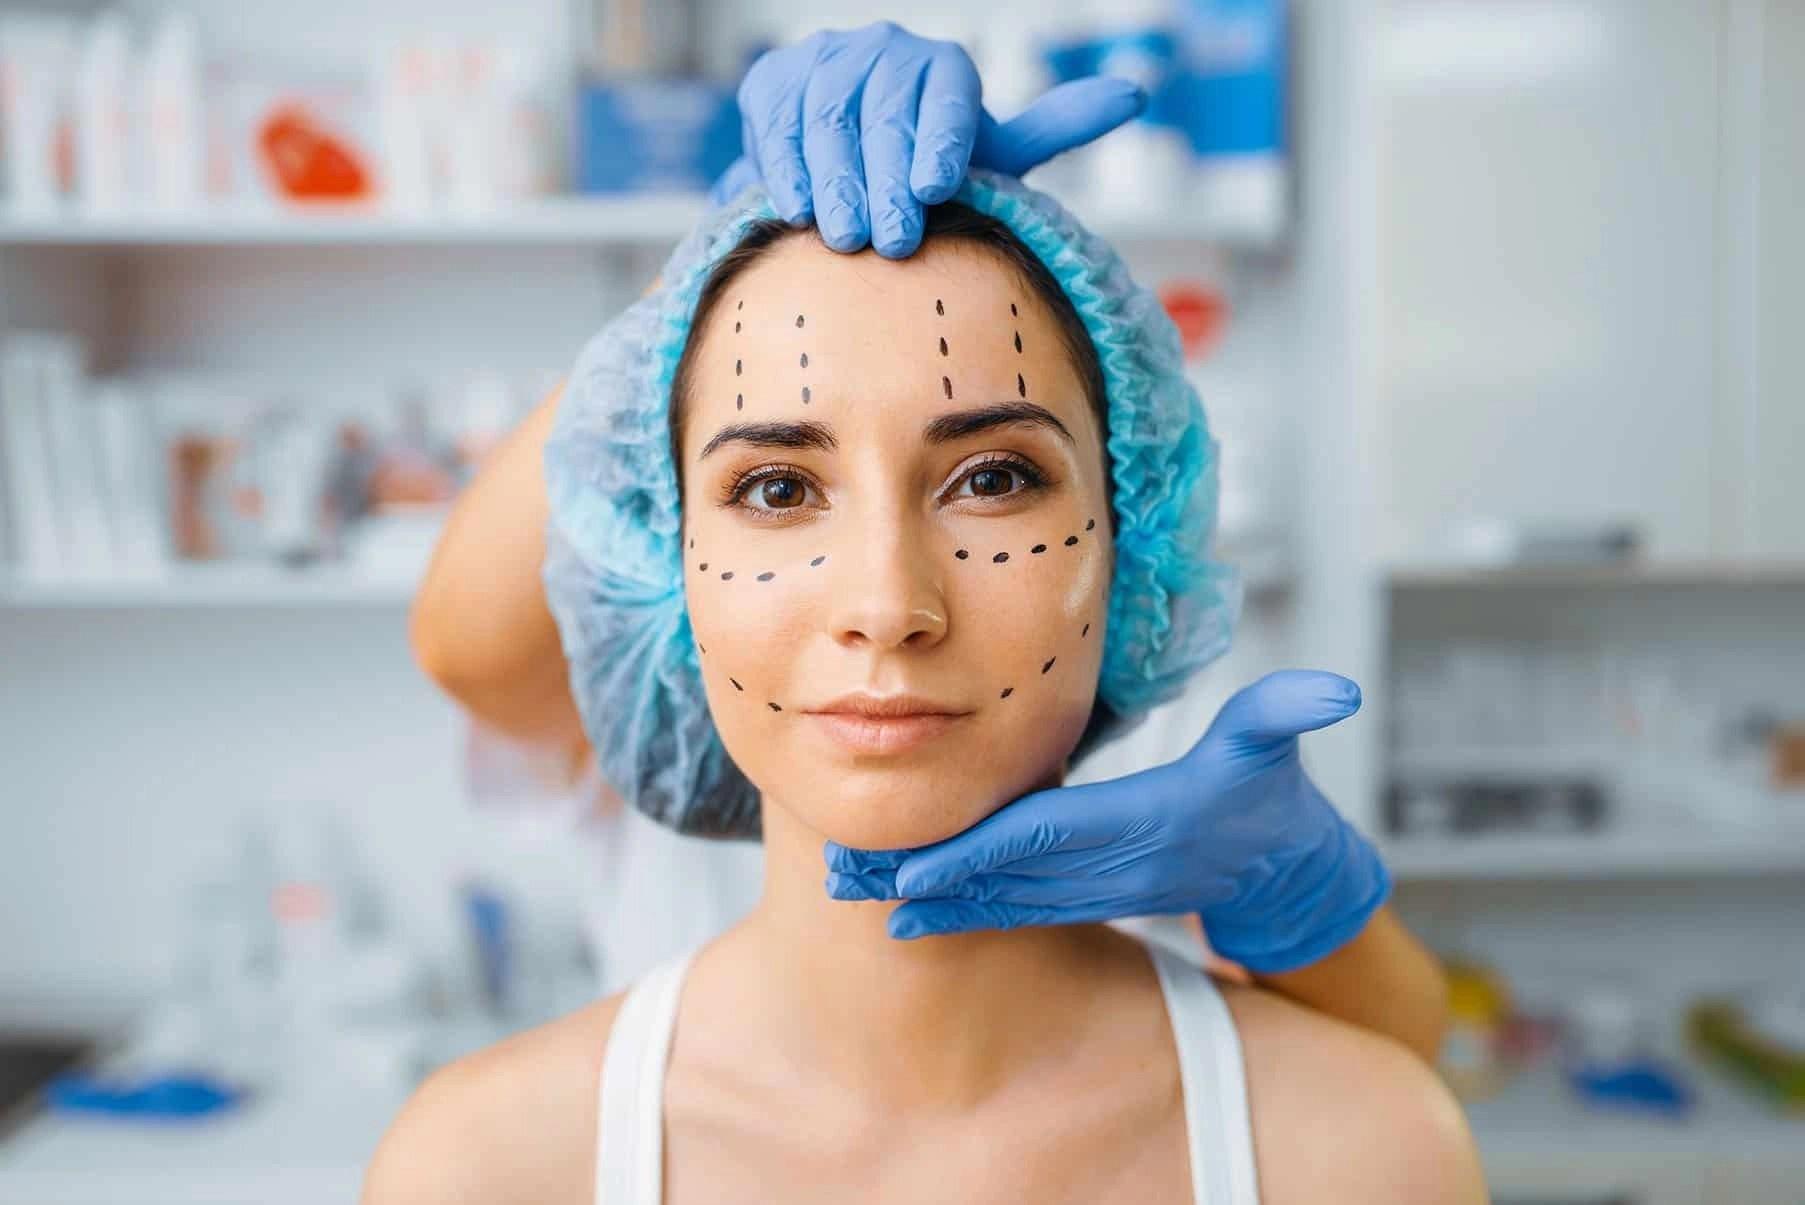 prepare for cosmetic surgery